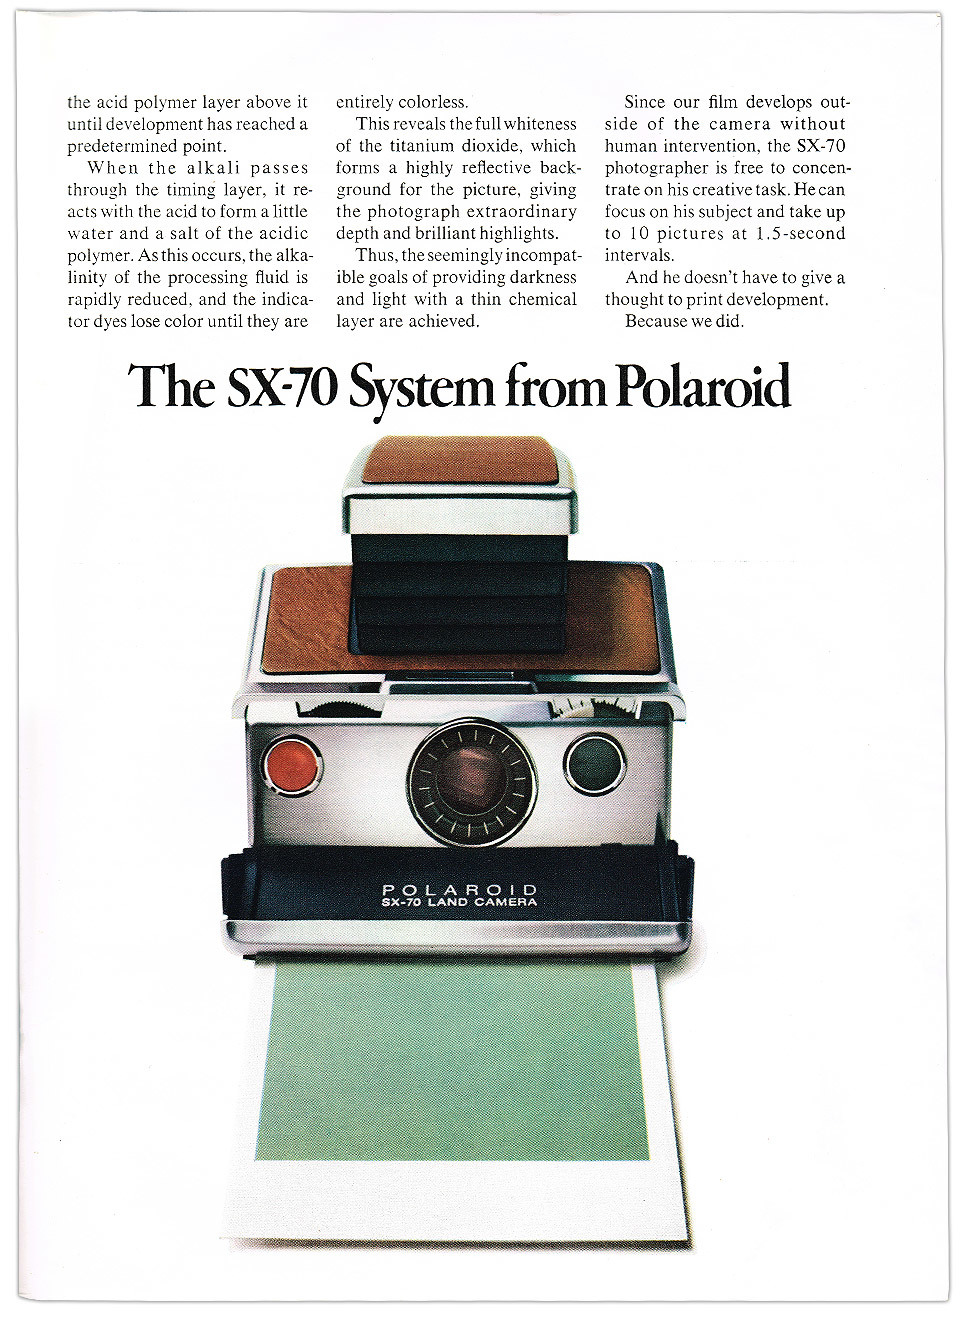 Polaroid SX-70 advert fromScientific American magazine.